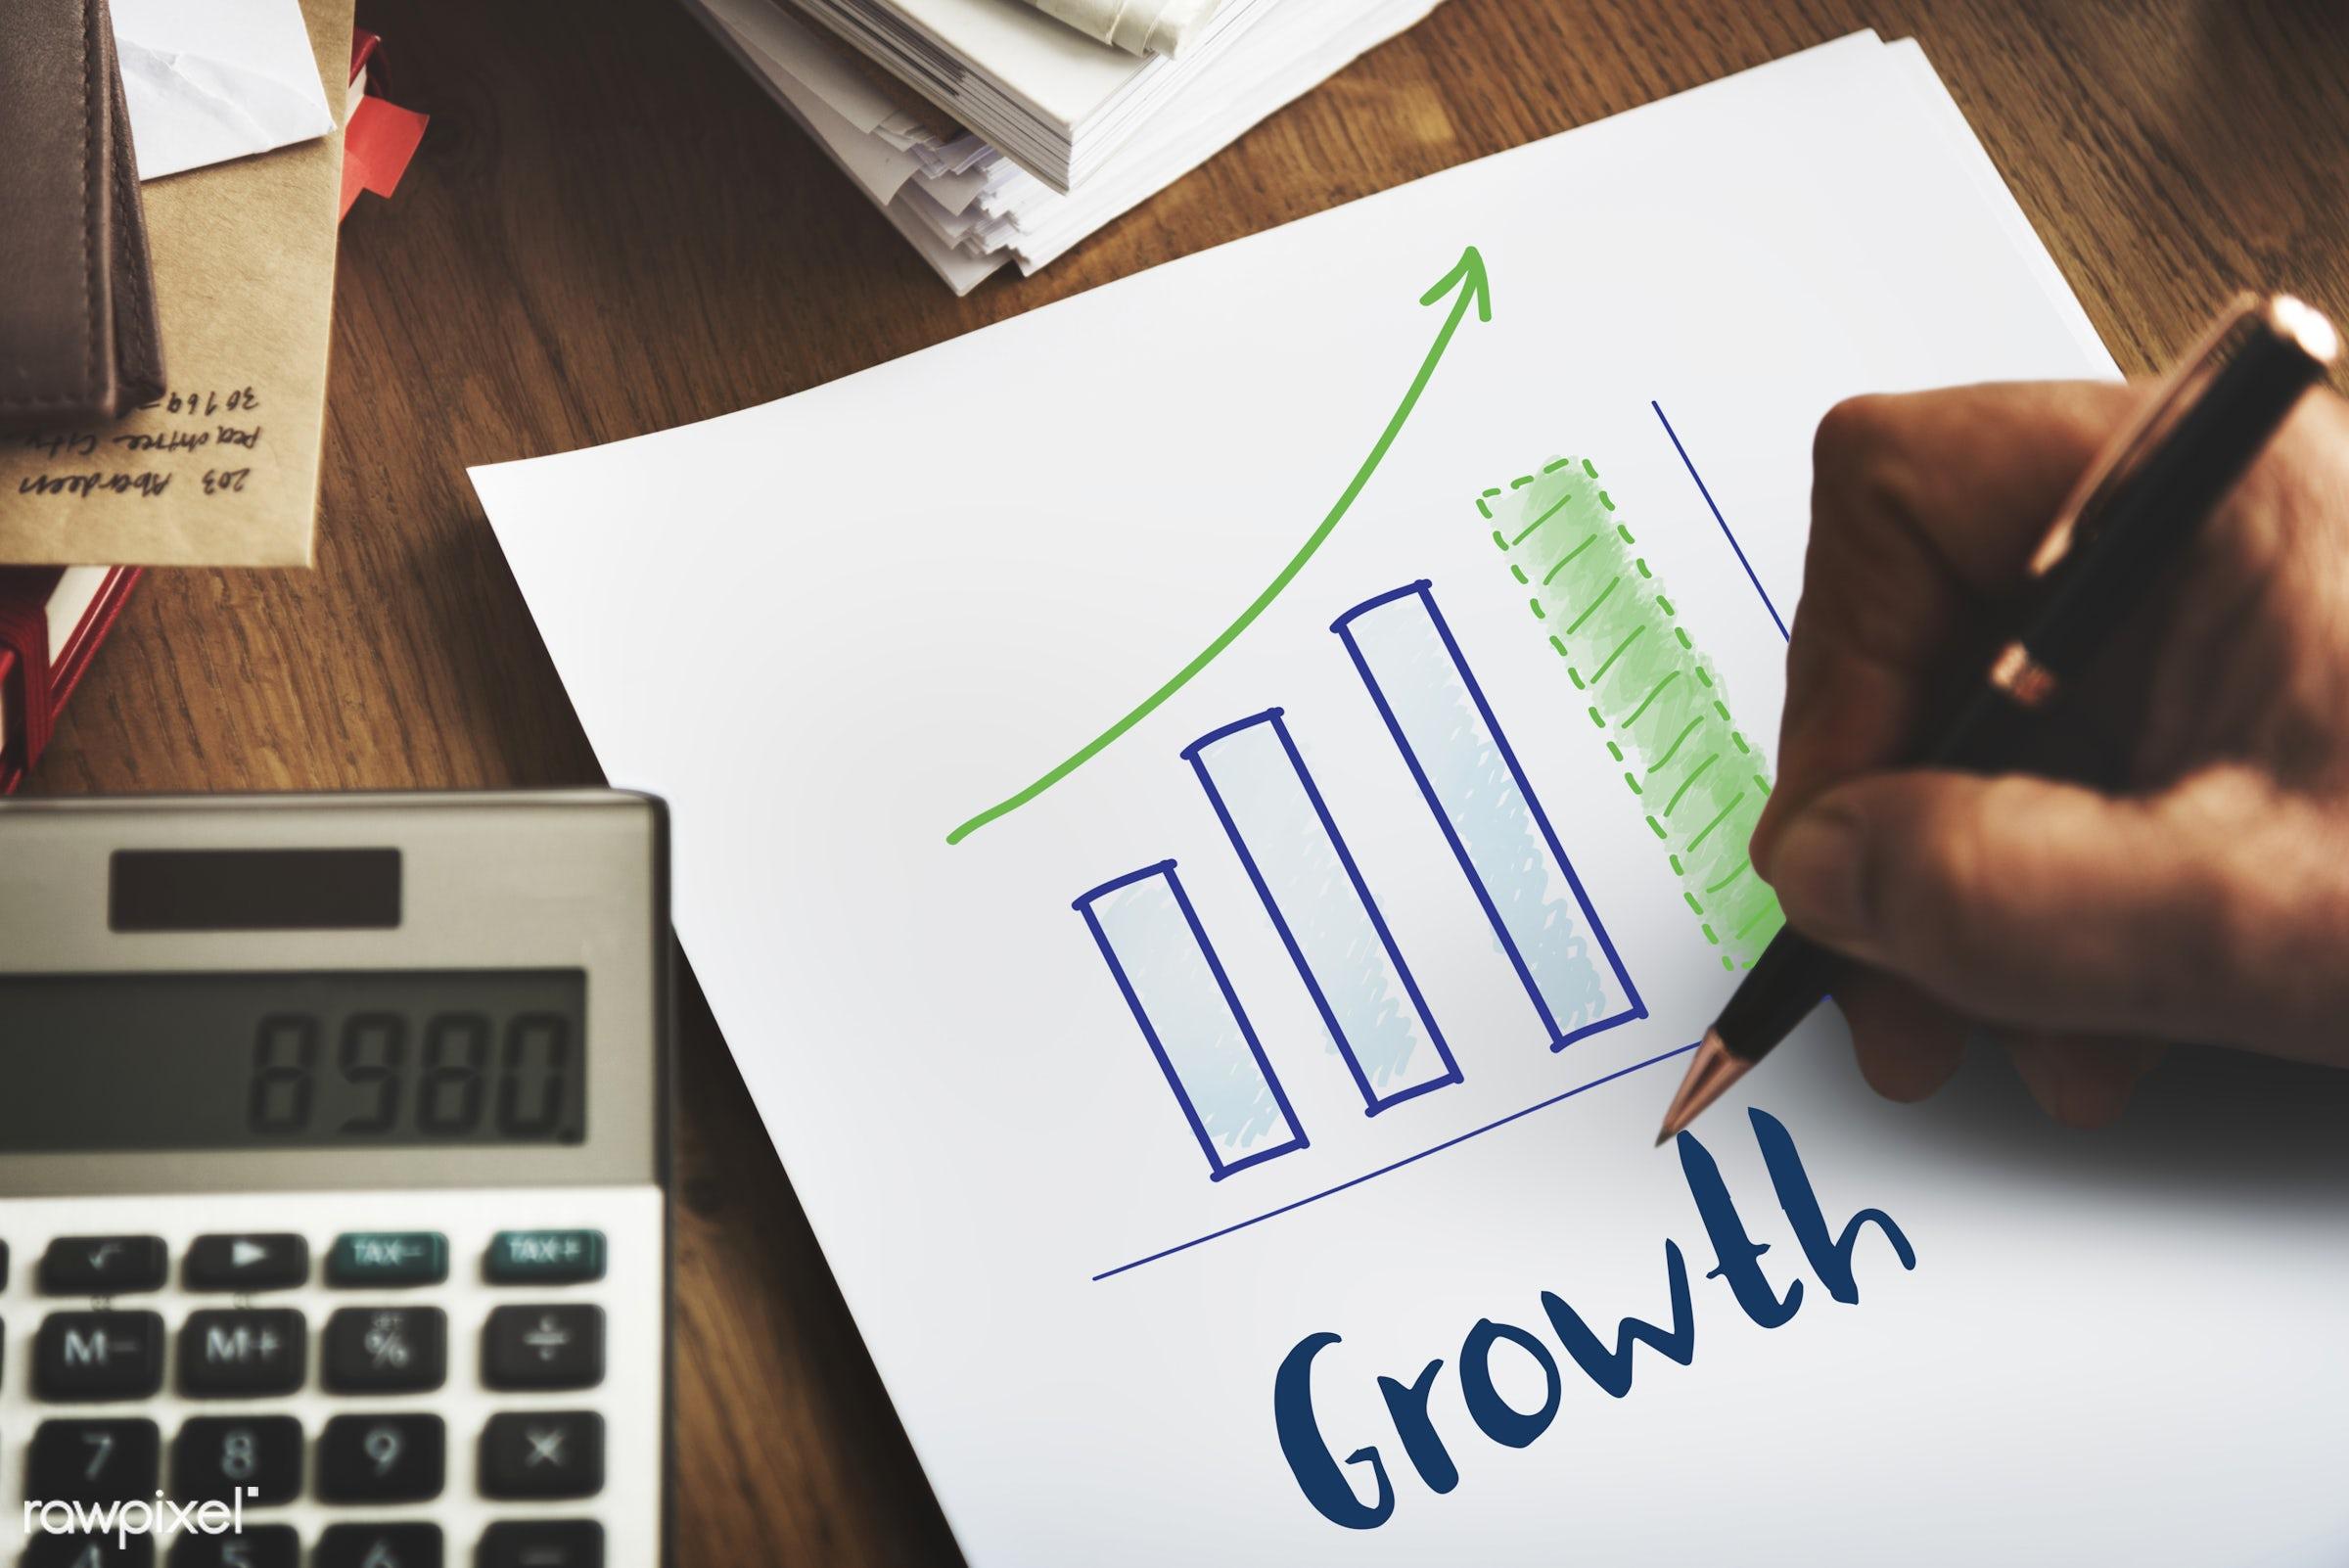 accountant, accounting, analyse, analysis, brainstorming, business, calculation, calculator, chart, computation, data....